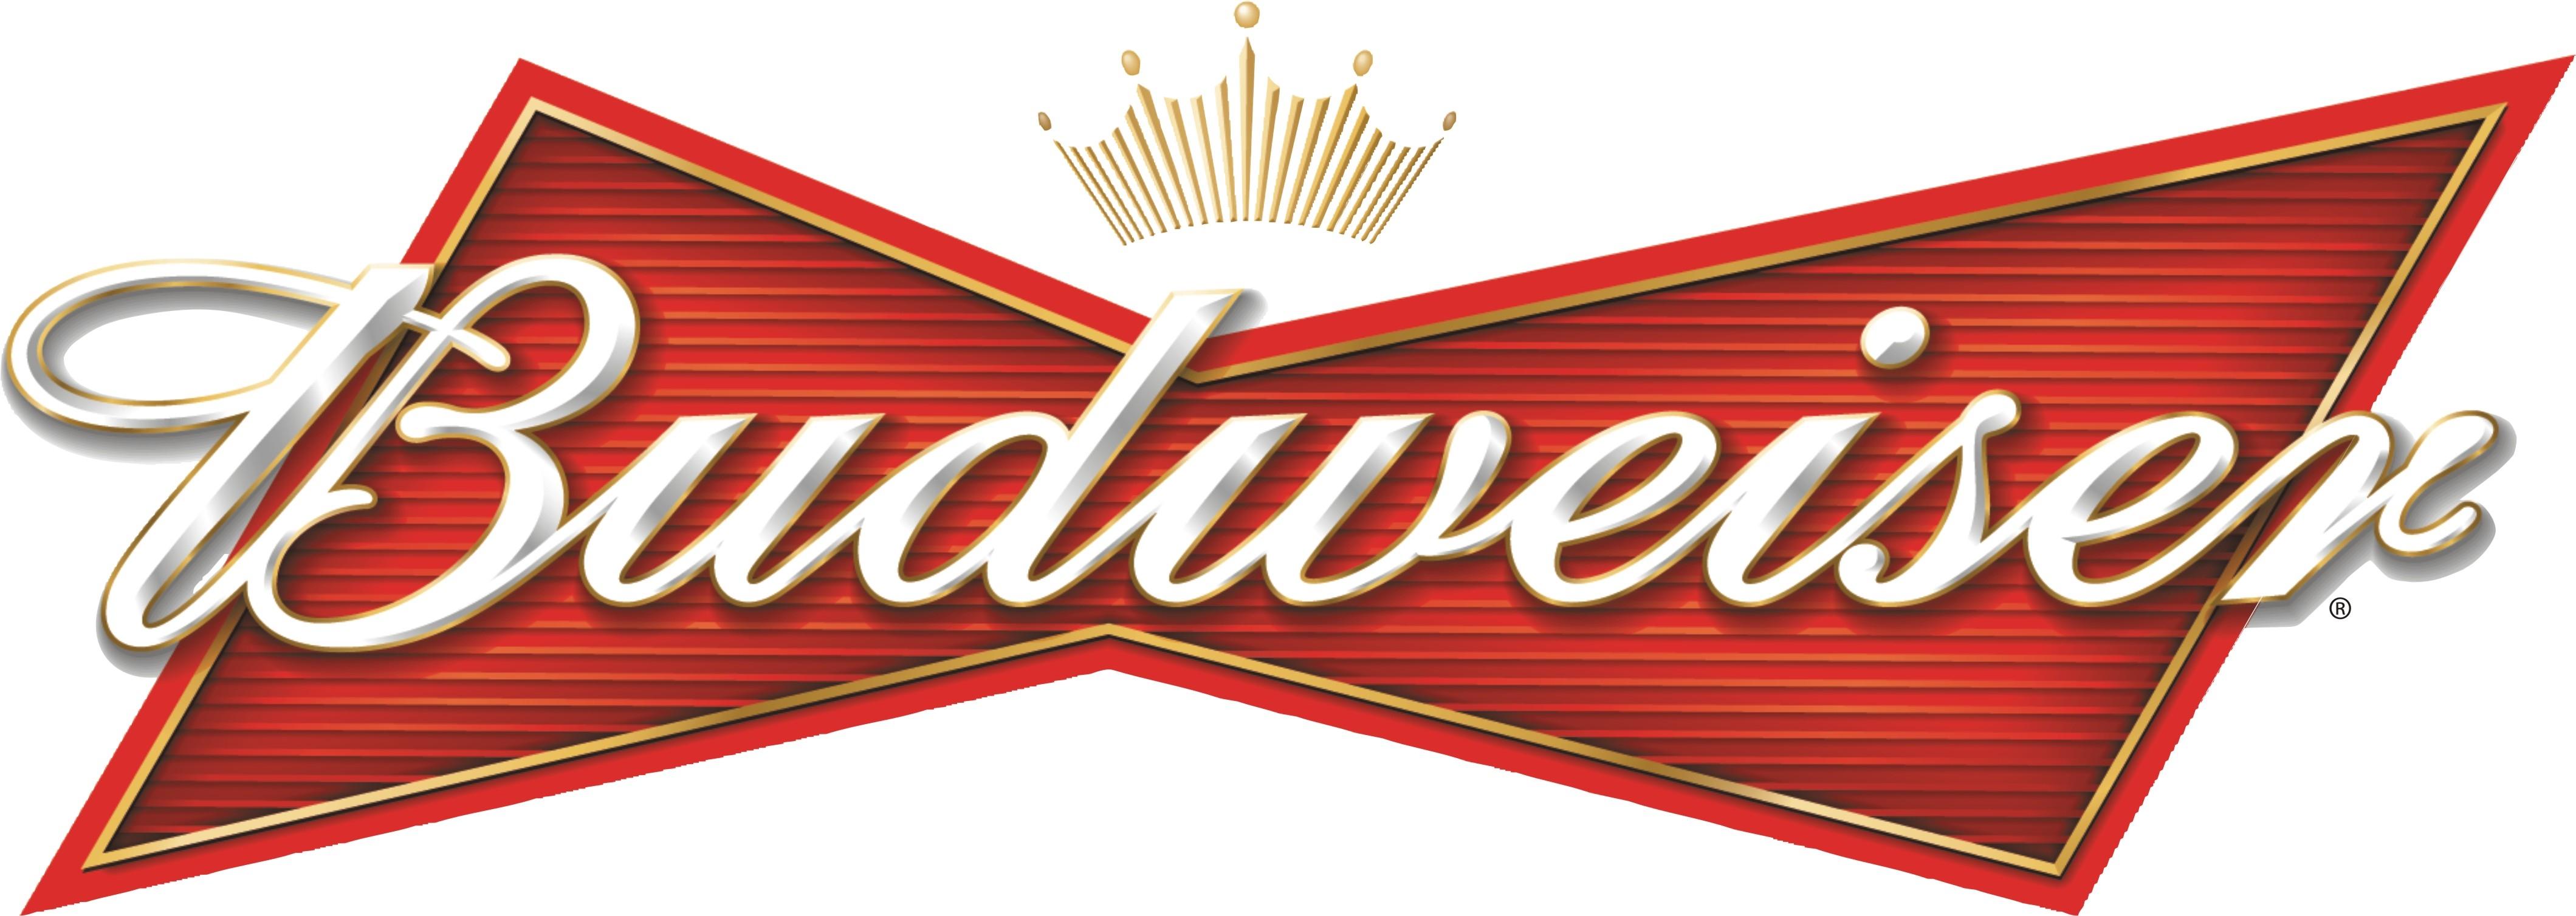 Nice wallpapers Budweiser 4239x1508px